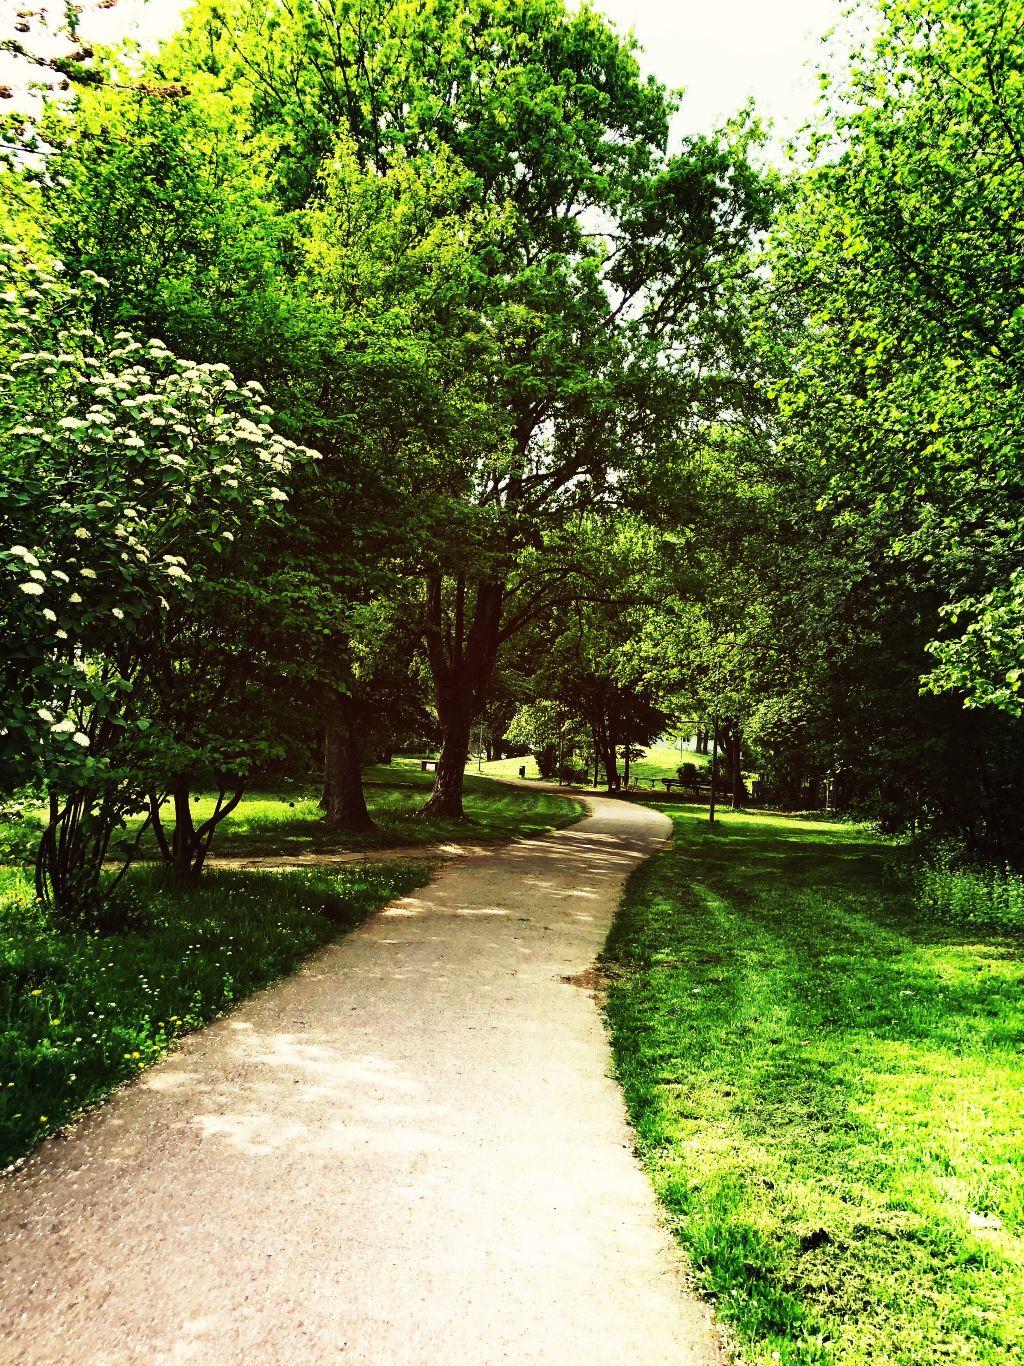 #freetoedit #interesting #photography #nature #trees #park